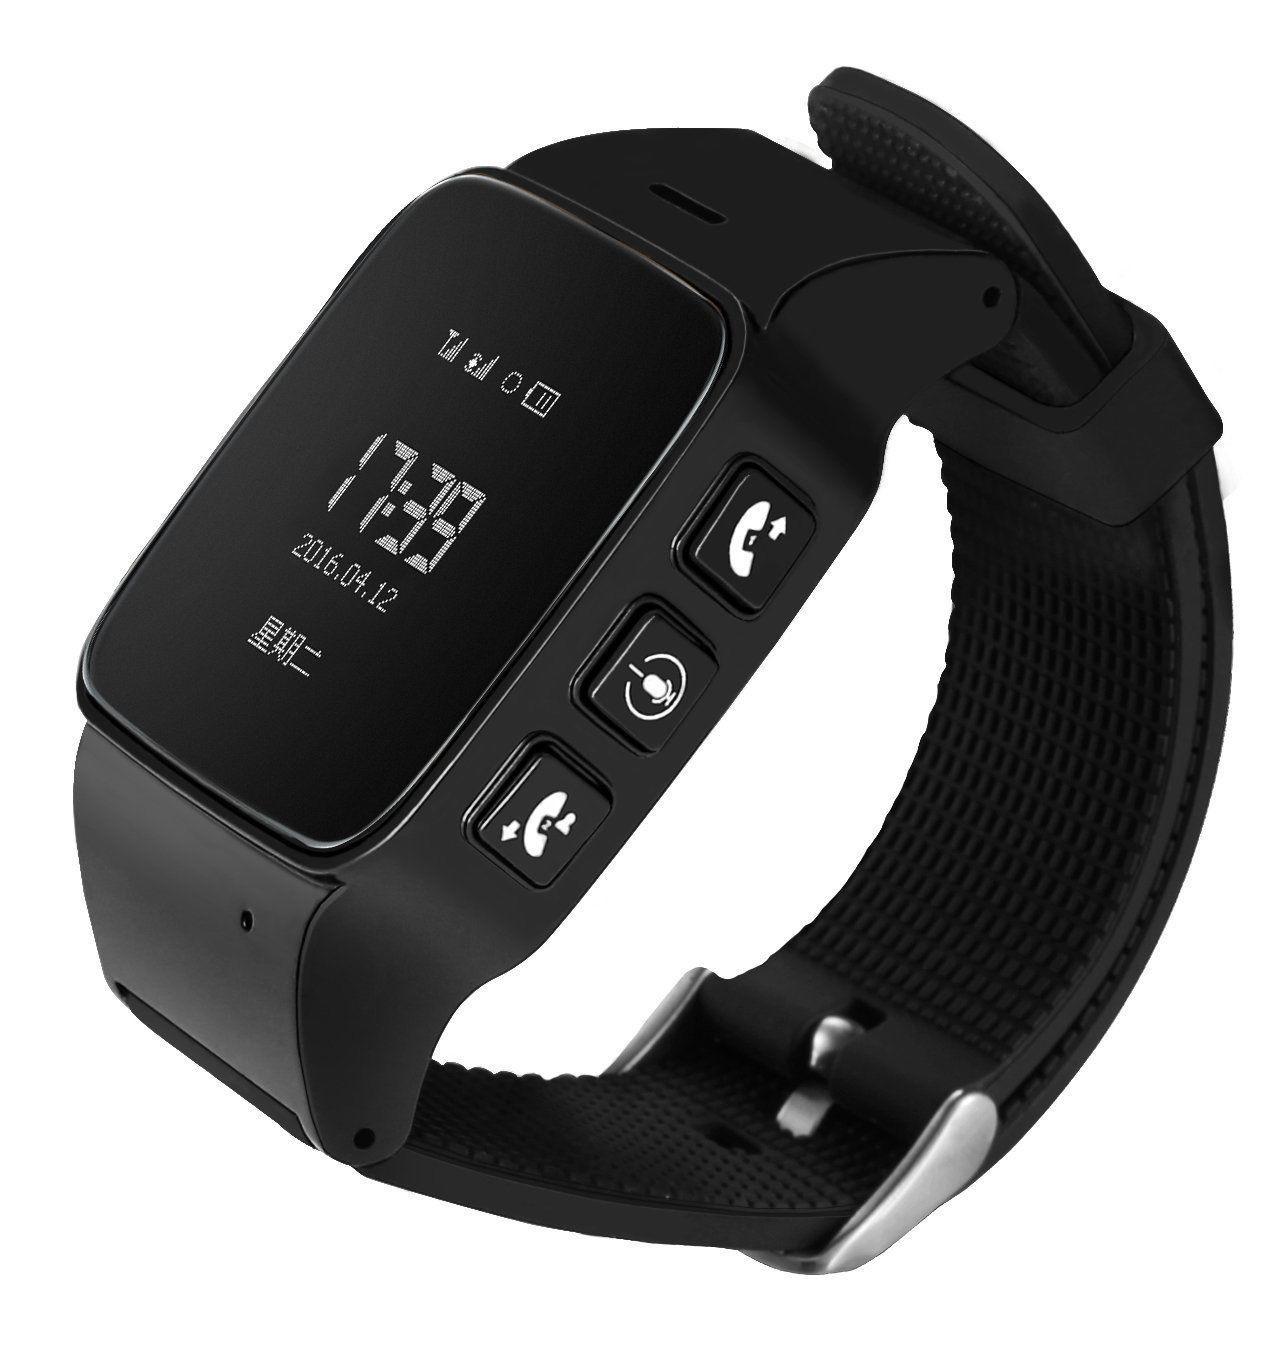 Resigilat! Ceas GPS Copii si Seniori iUni U100, Telefon incorporat, Pedometru, Notificari, Wi-fi, Negru imagine techstar.ro 2021